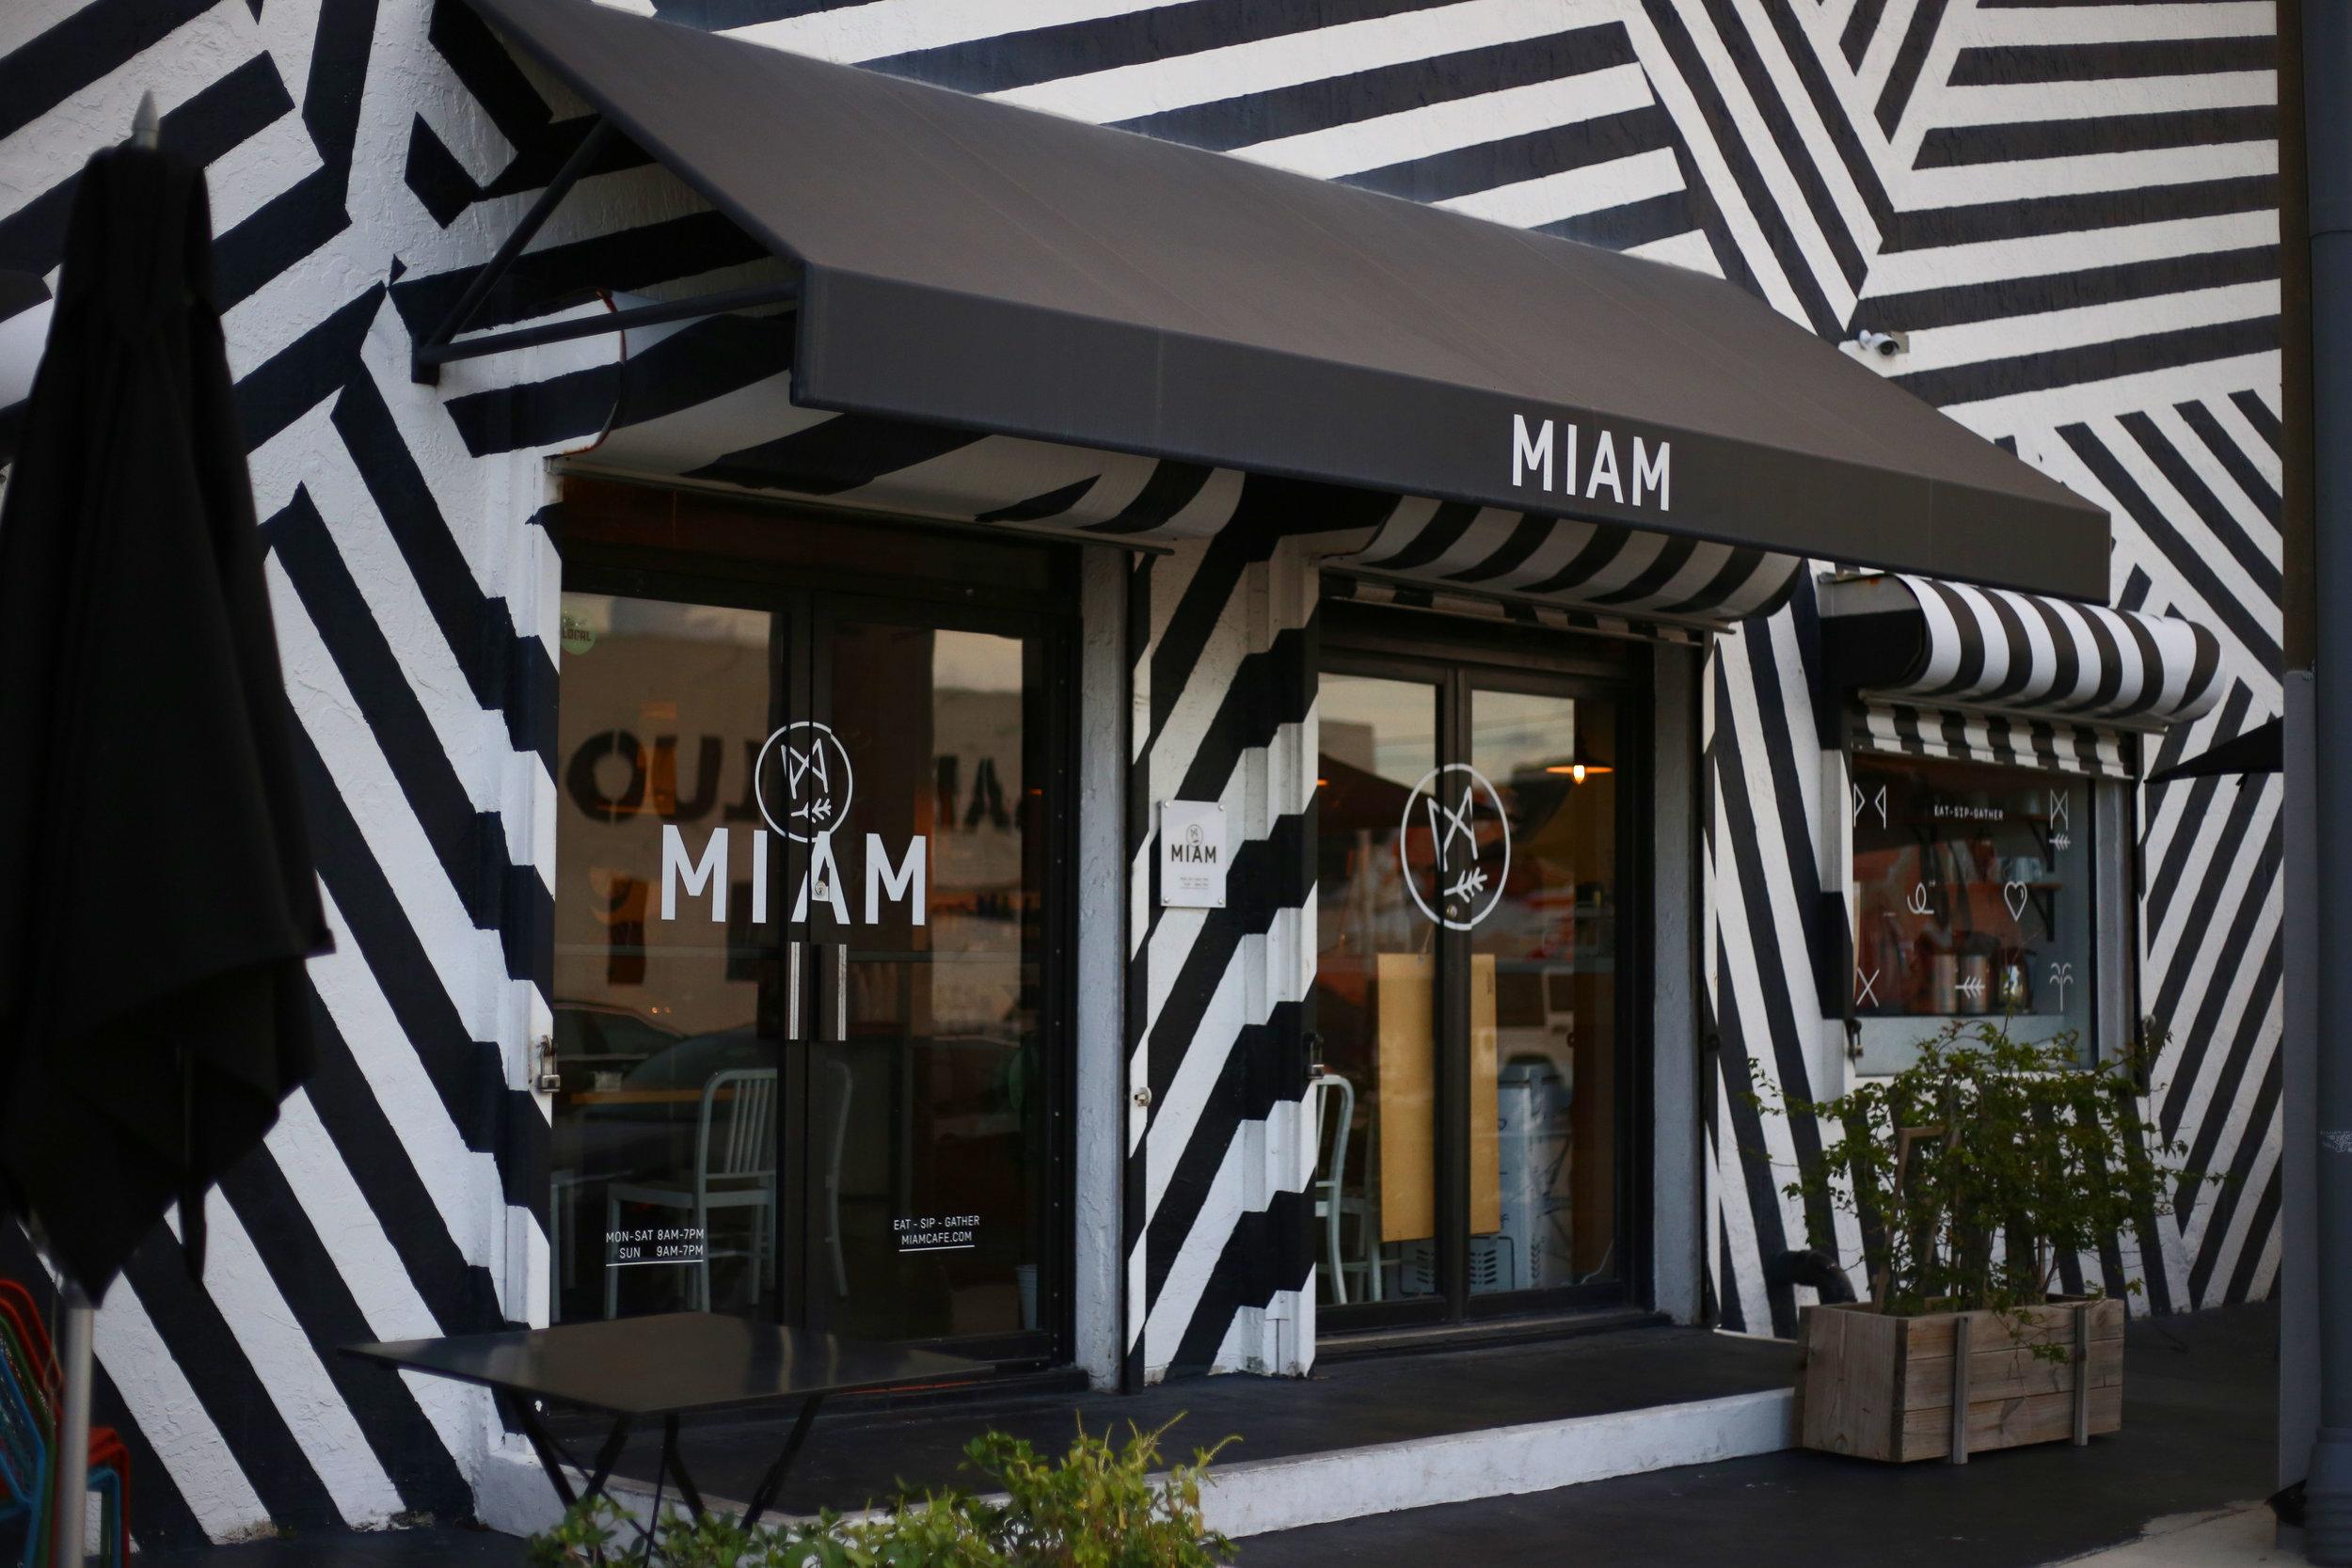 Miam_Coffee_Exterior_Miami.jpg